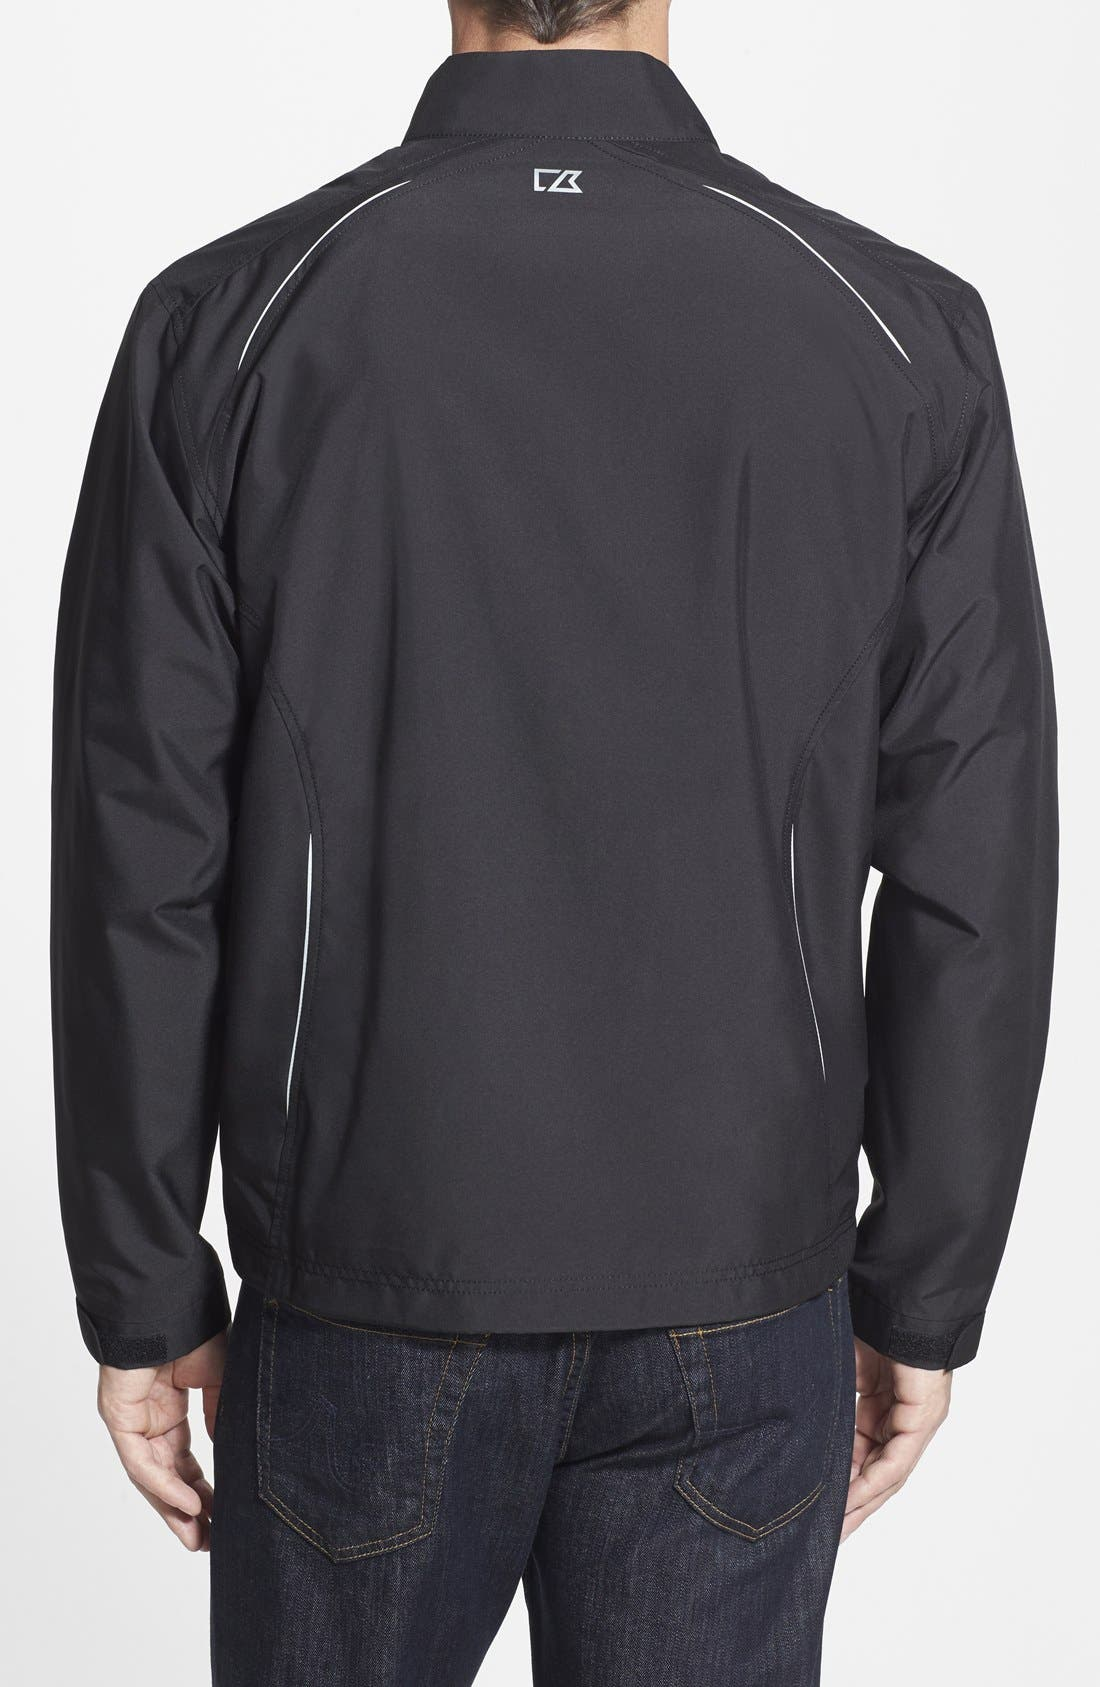 Carolina Panthers - Beacon WeatherTec Wind & Water Resistant Jacket,                             Alternate thumbnail 2, color,                             Black